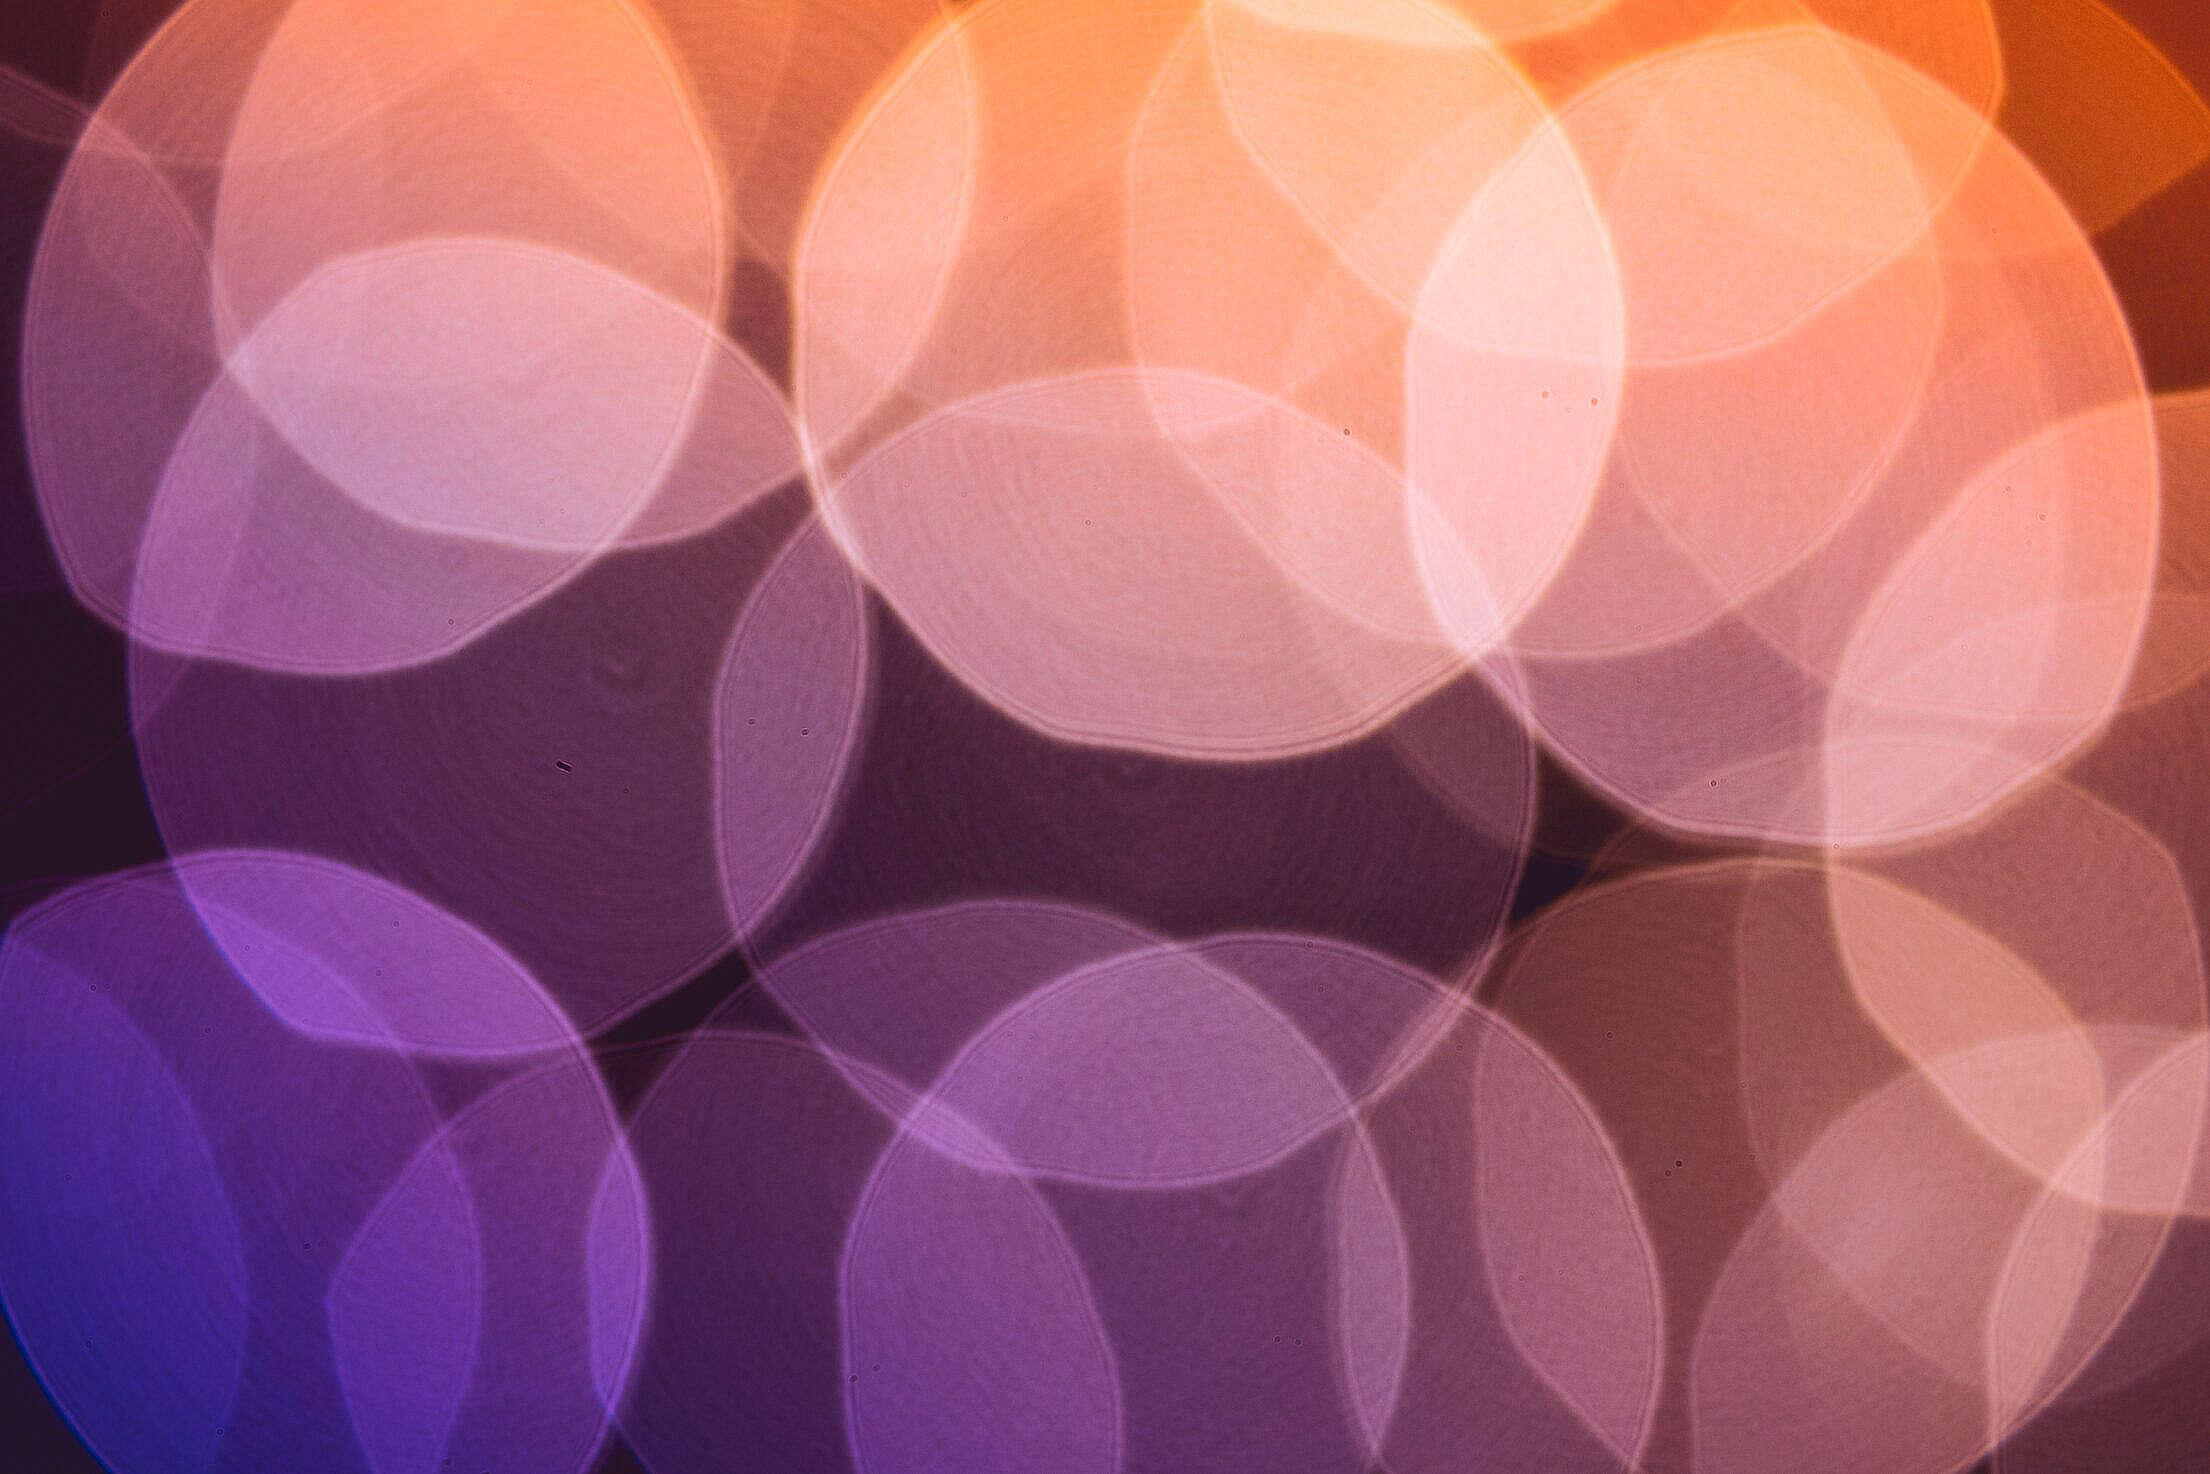 Crazy Real Lights Violet & Orange Colorful Bokeh Free Stock Photo